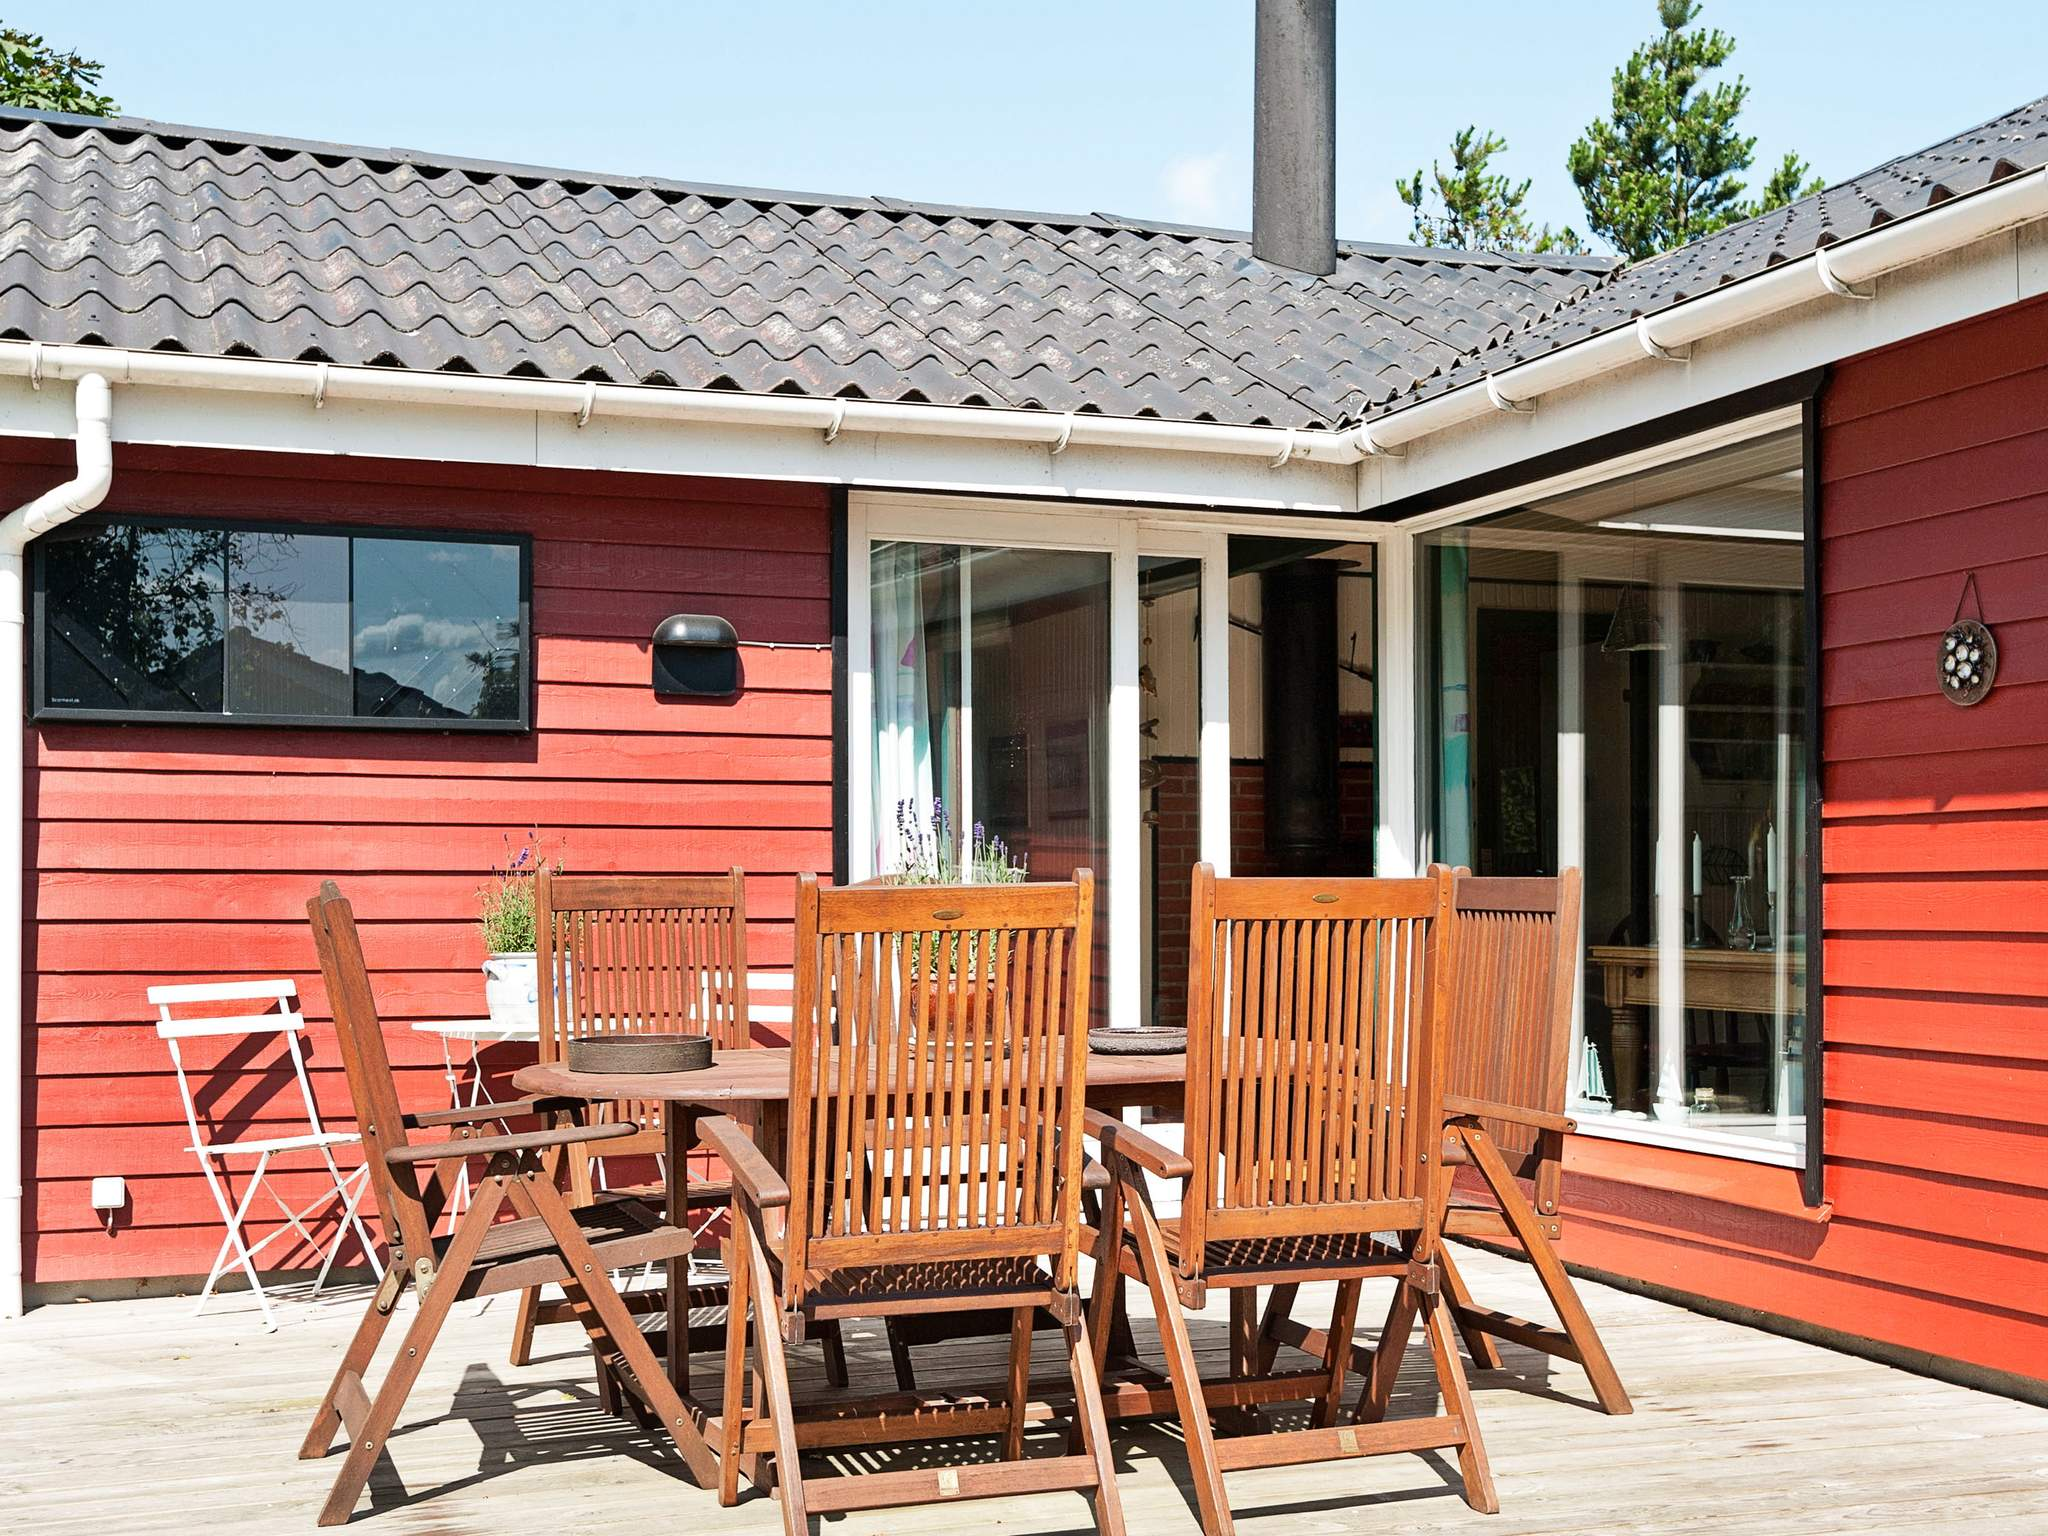 Ferienhaus Skaven Strand (493385), Tarm, , Westjütland, Dänemark, Bild 27